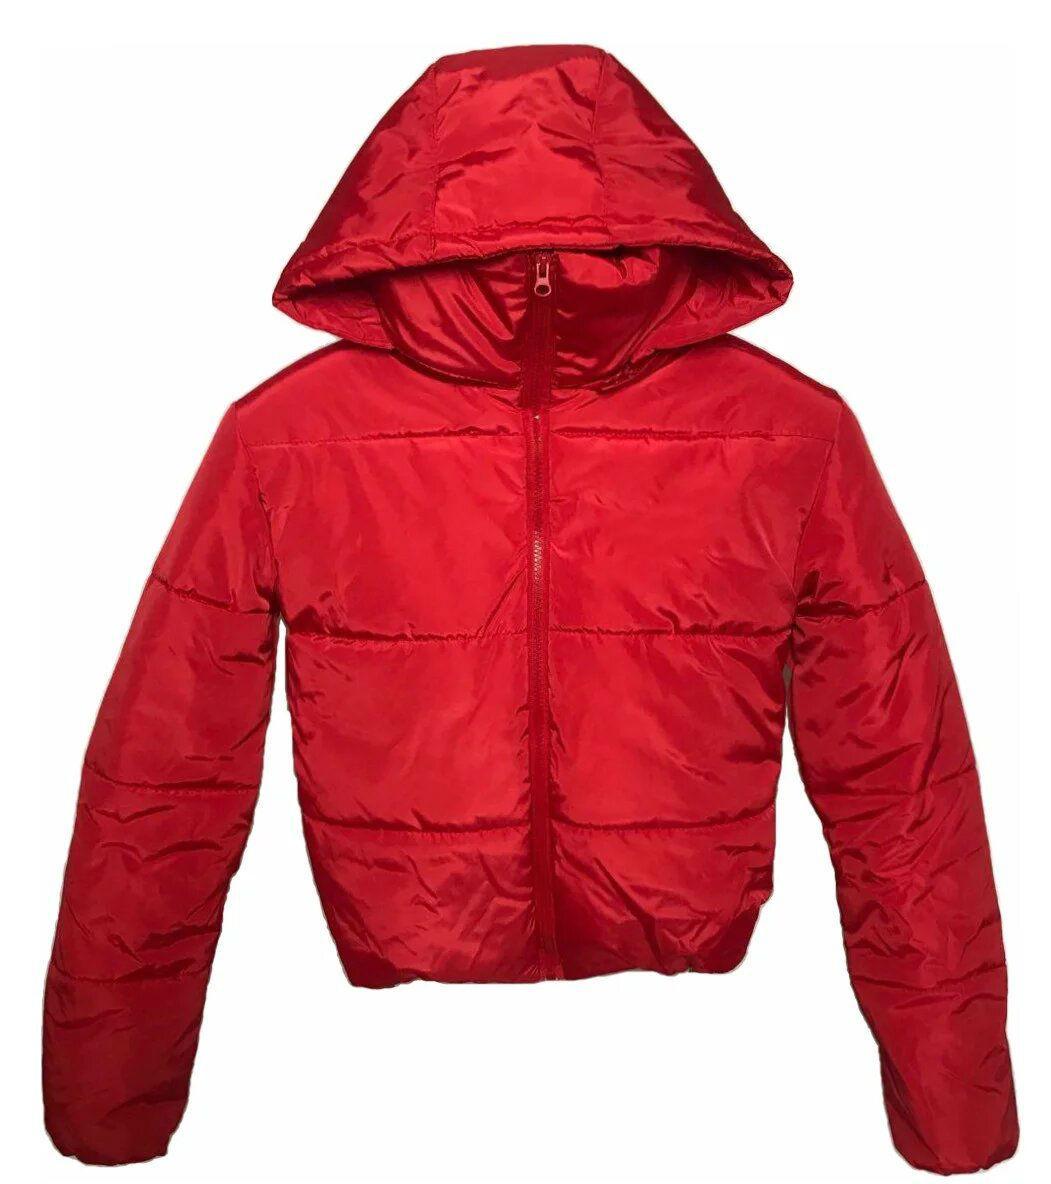 Короткая красная куртка с капюшоном,  осень/зима размеры 42 - 48